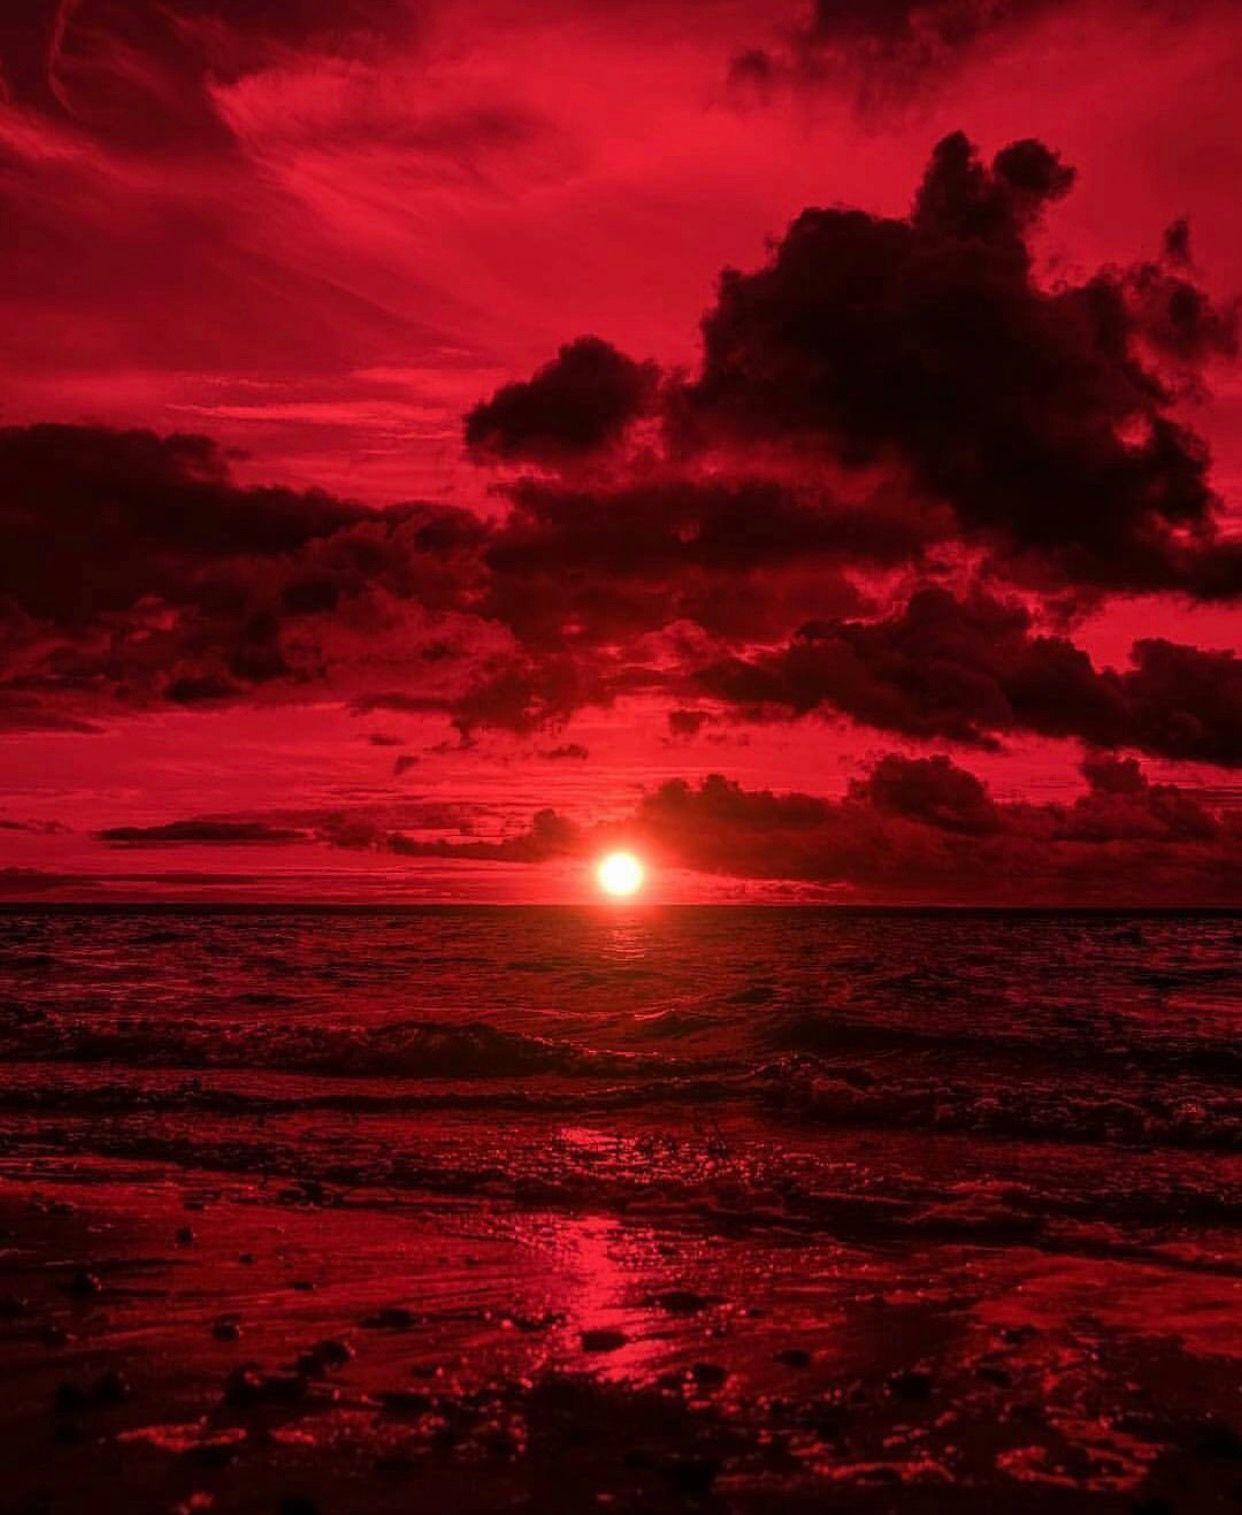 Pin by 🌹chlöebabyxöxö🌹 on *༺༶ ༚ i ️Red ༚ ༶༻*   Red ...